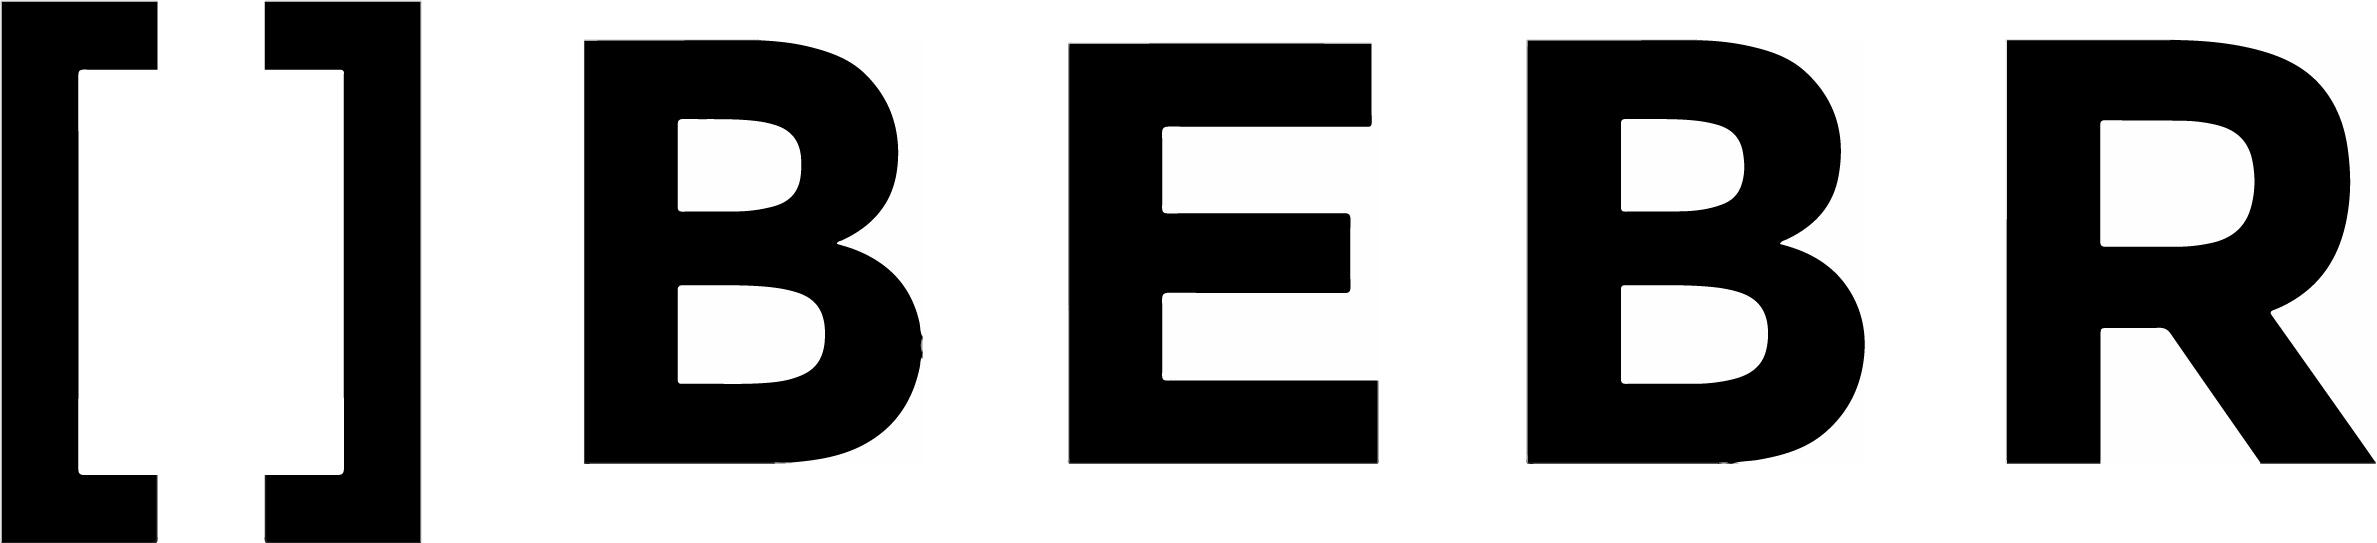 Logo BEBR